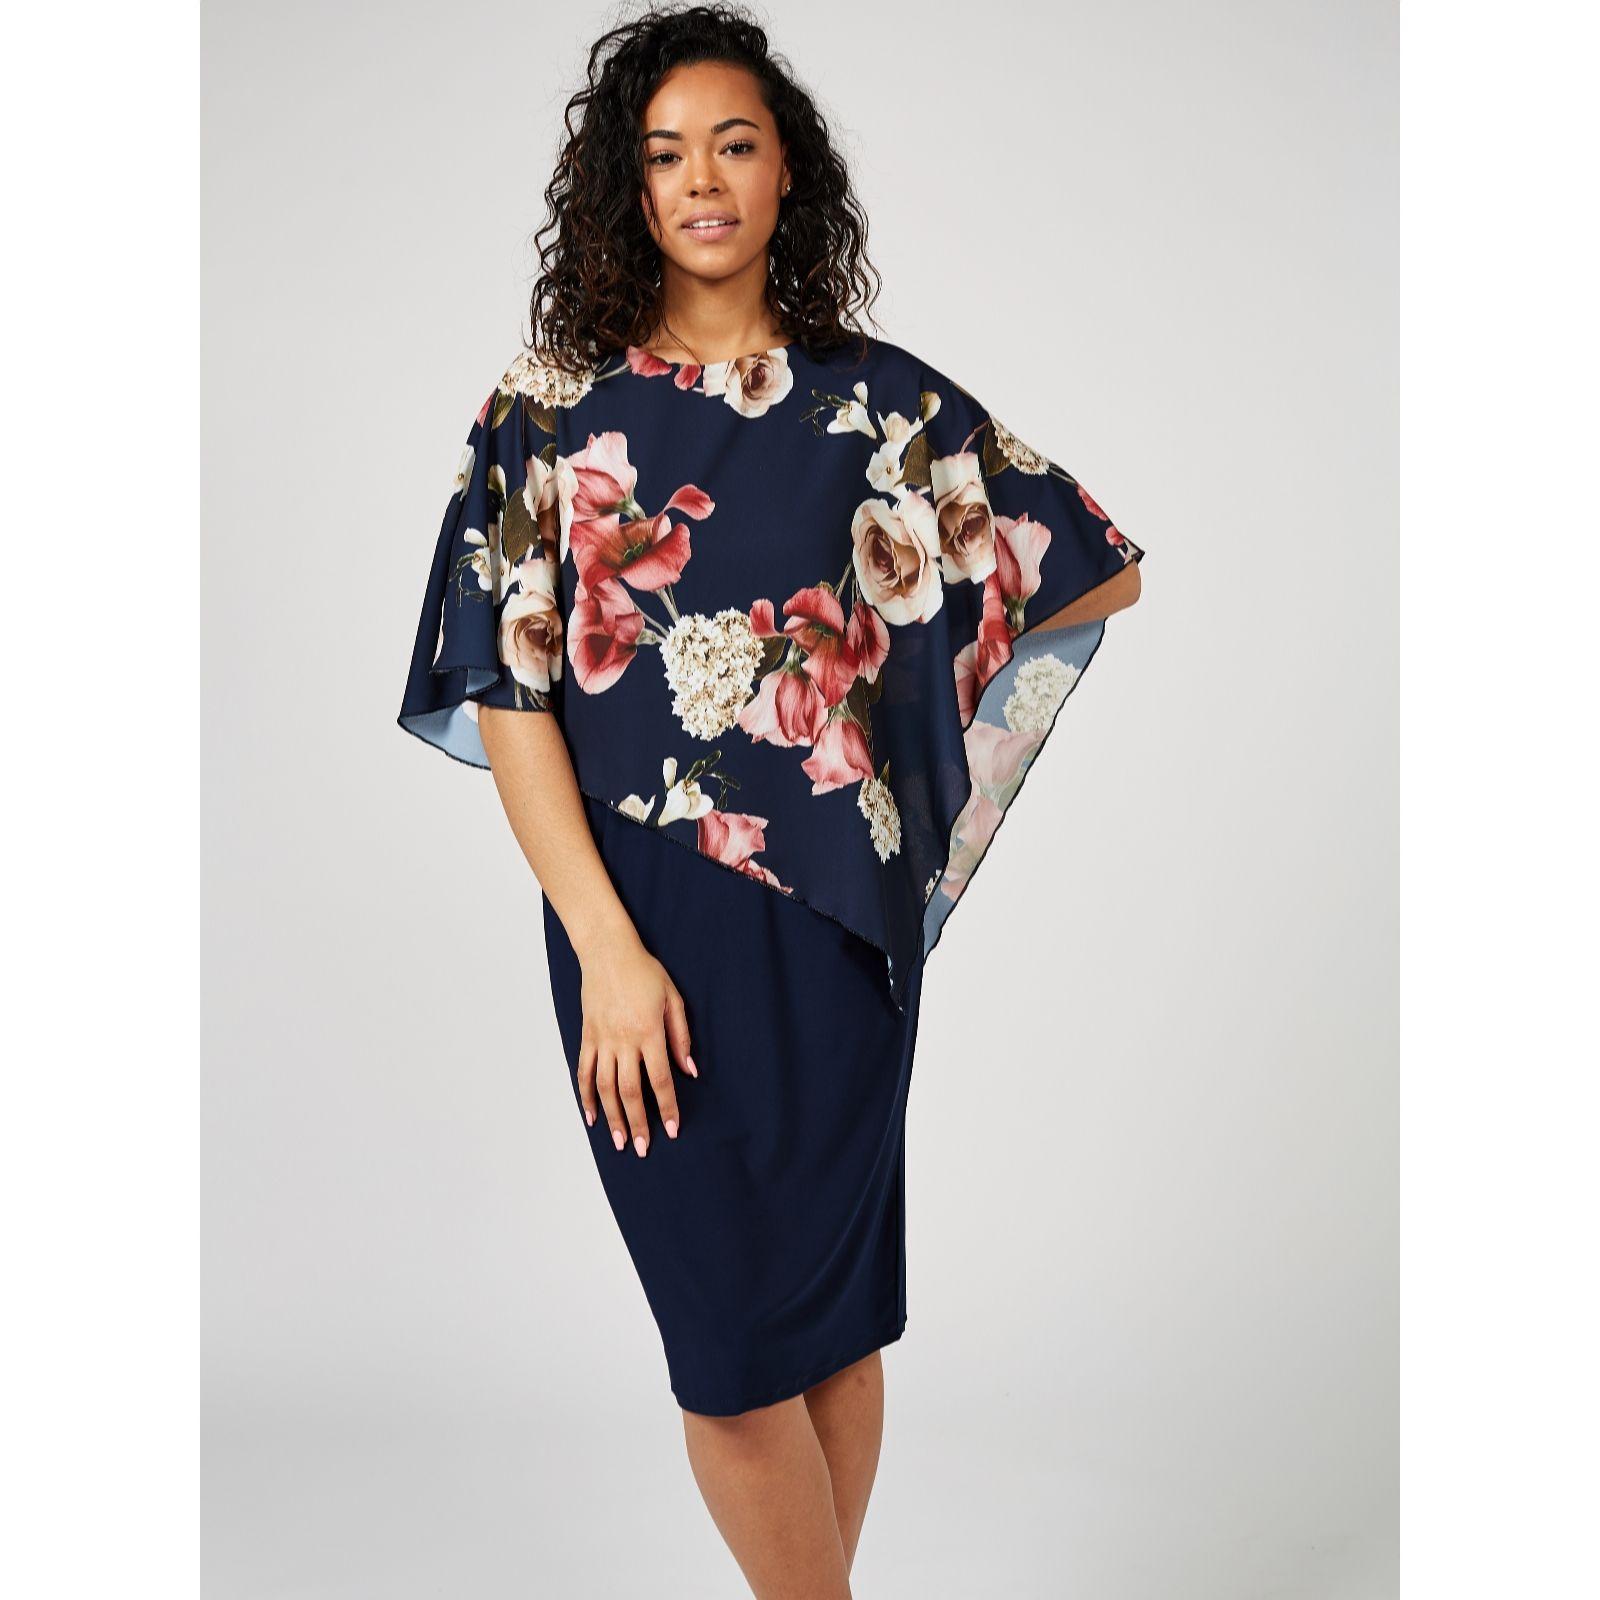 897752f3ff490 Grace Floral Chiffon Overlay Dress - QVC UK